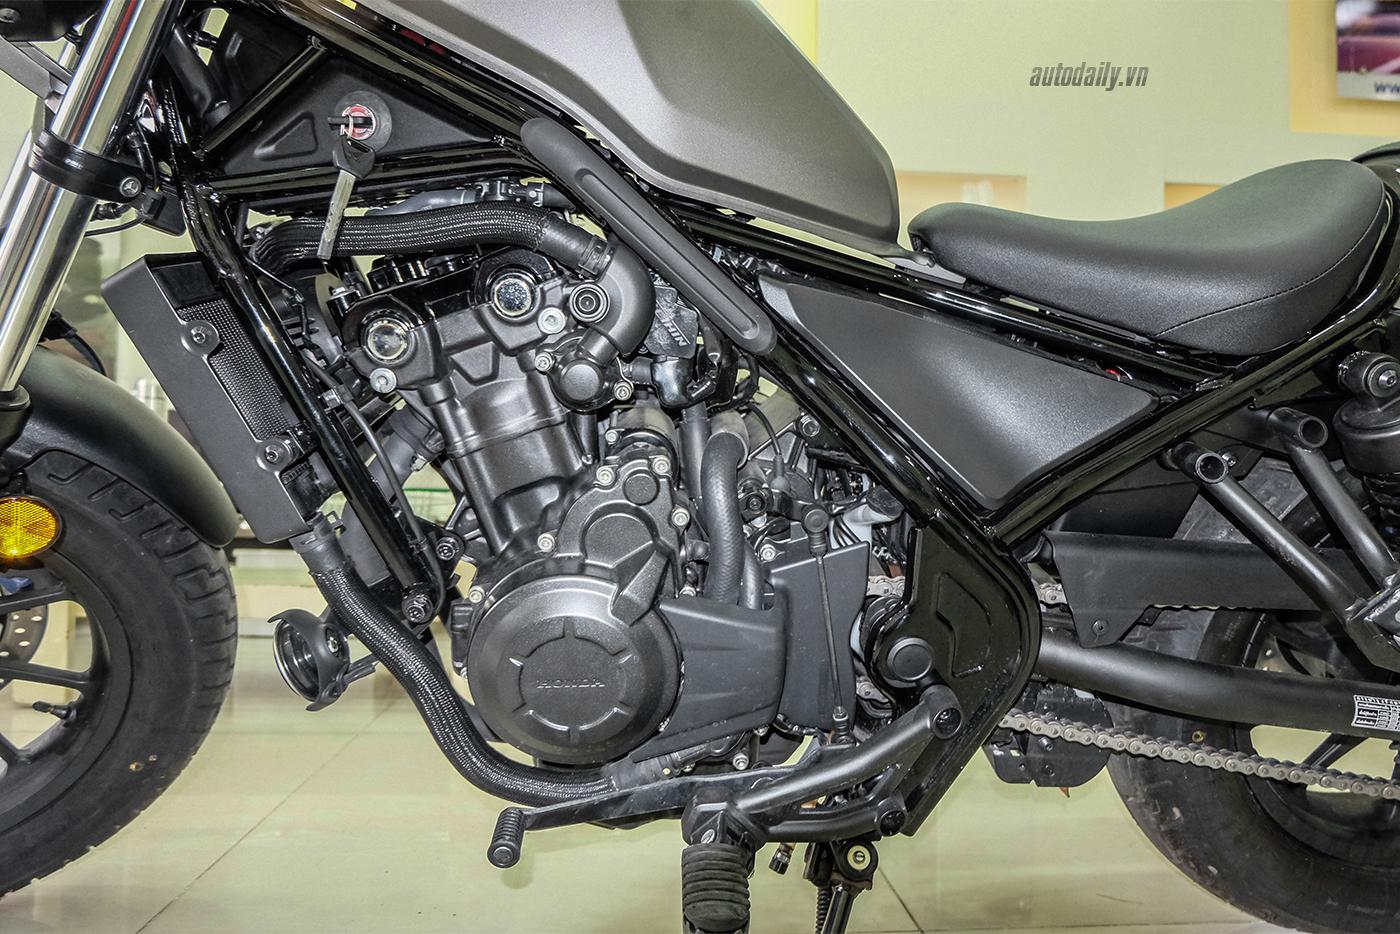 honda-rebel-500-abs-2017-4-1.jpg